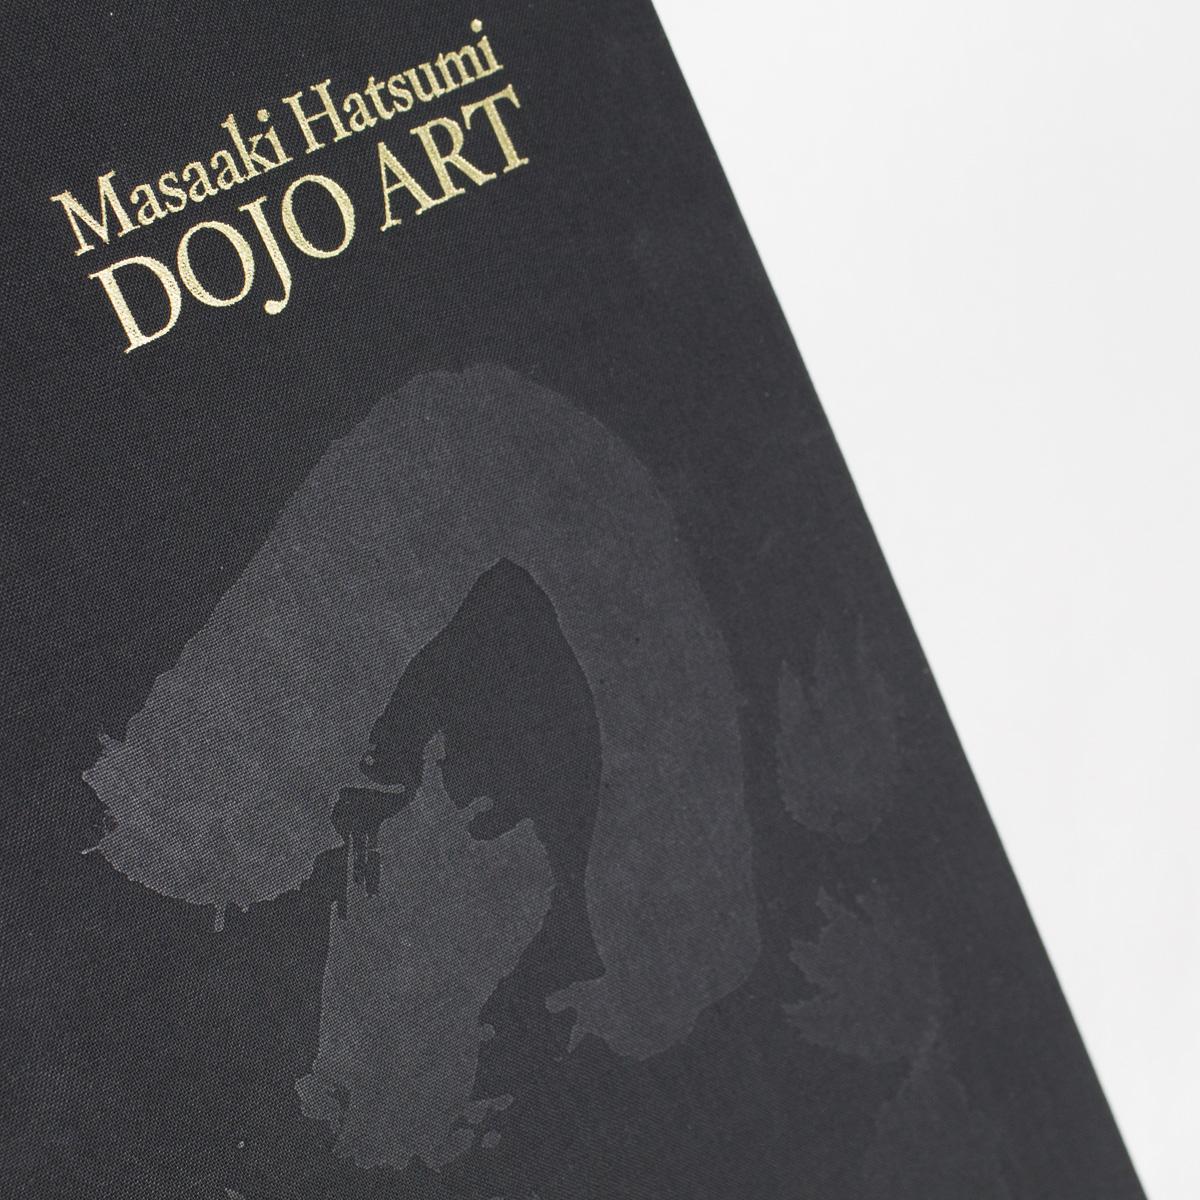 Masaaki Hatsumi: Dojo Art